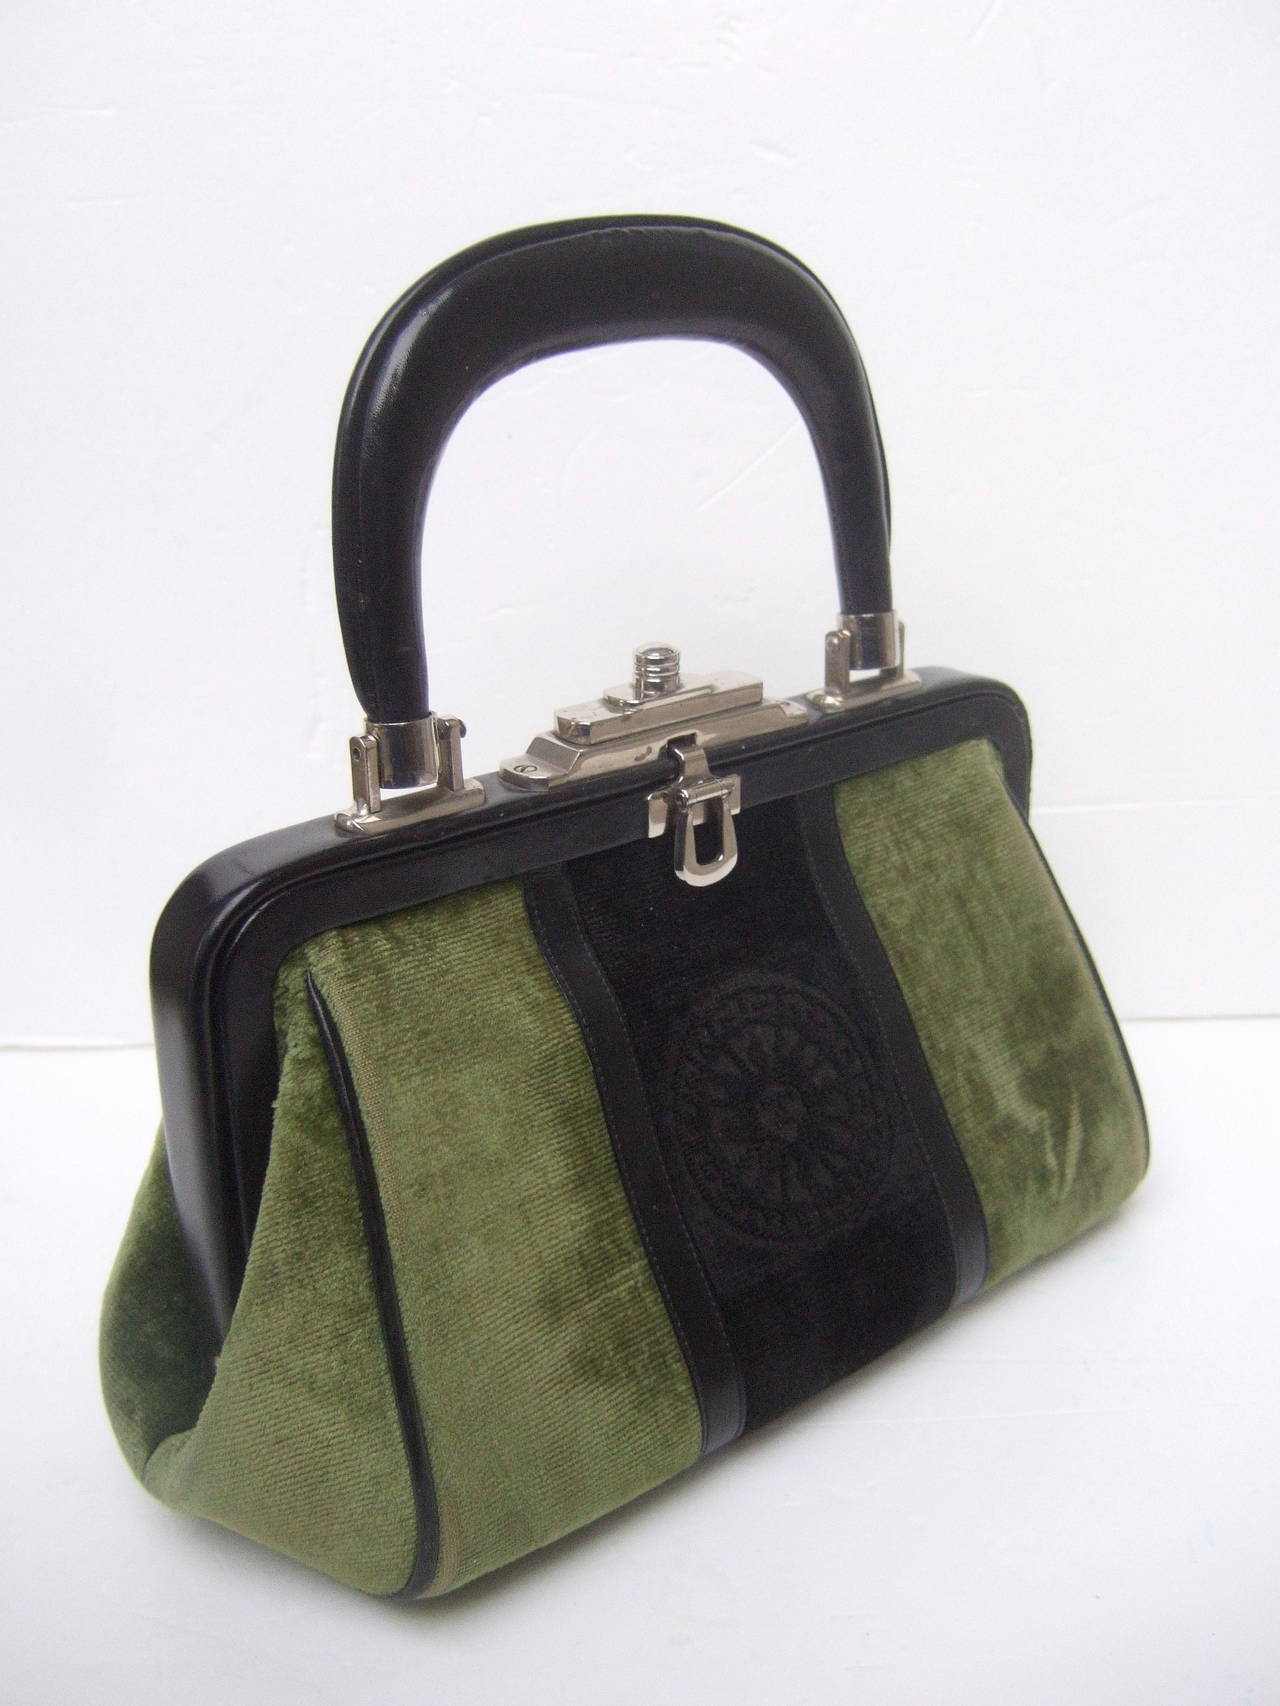 Roberta Di Camerino Chic moss green & ebony velvet handbag c 1970s   The iconic Italian handbag is covered with plush moss green & ebony velvet  The stylish handbag is designed with a black leather handle & clasp frame Accented with black leather